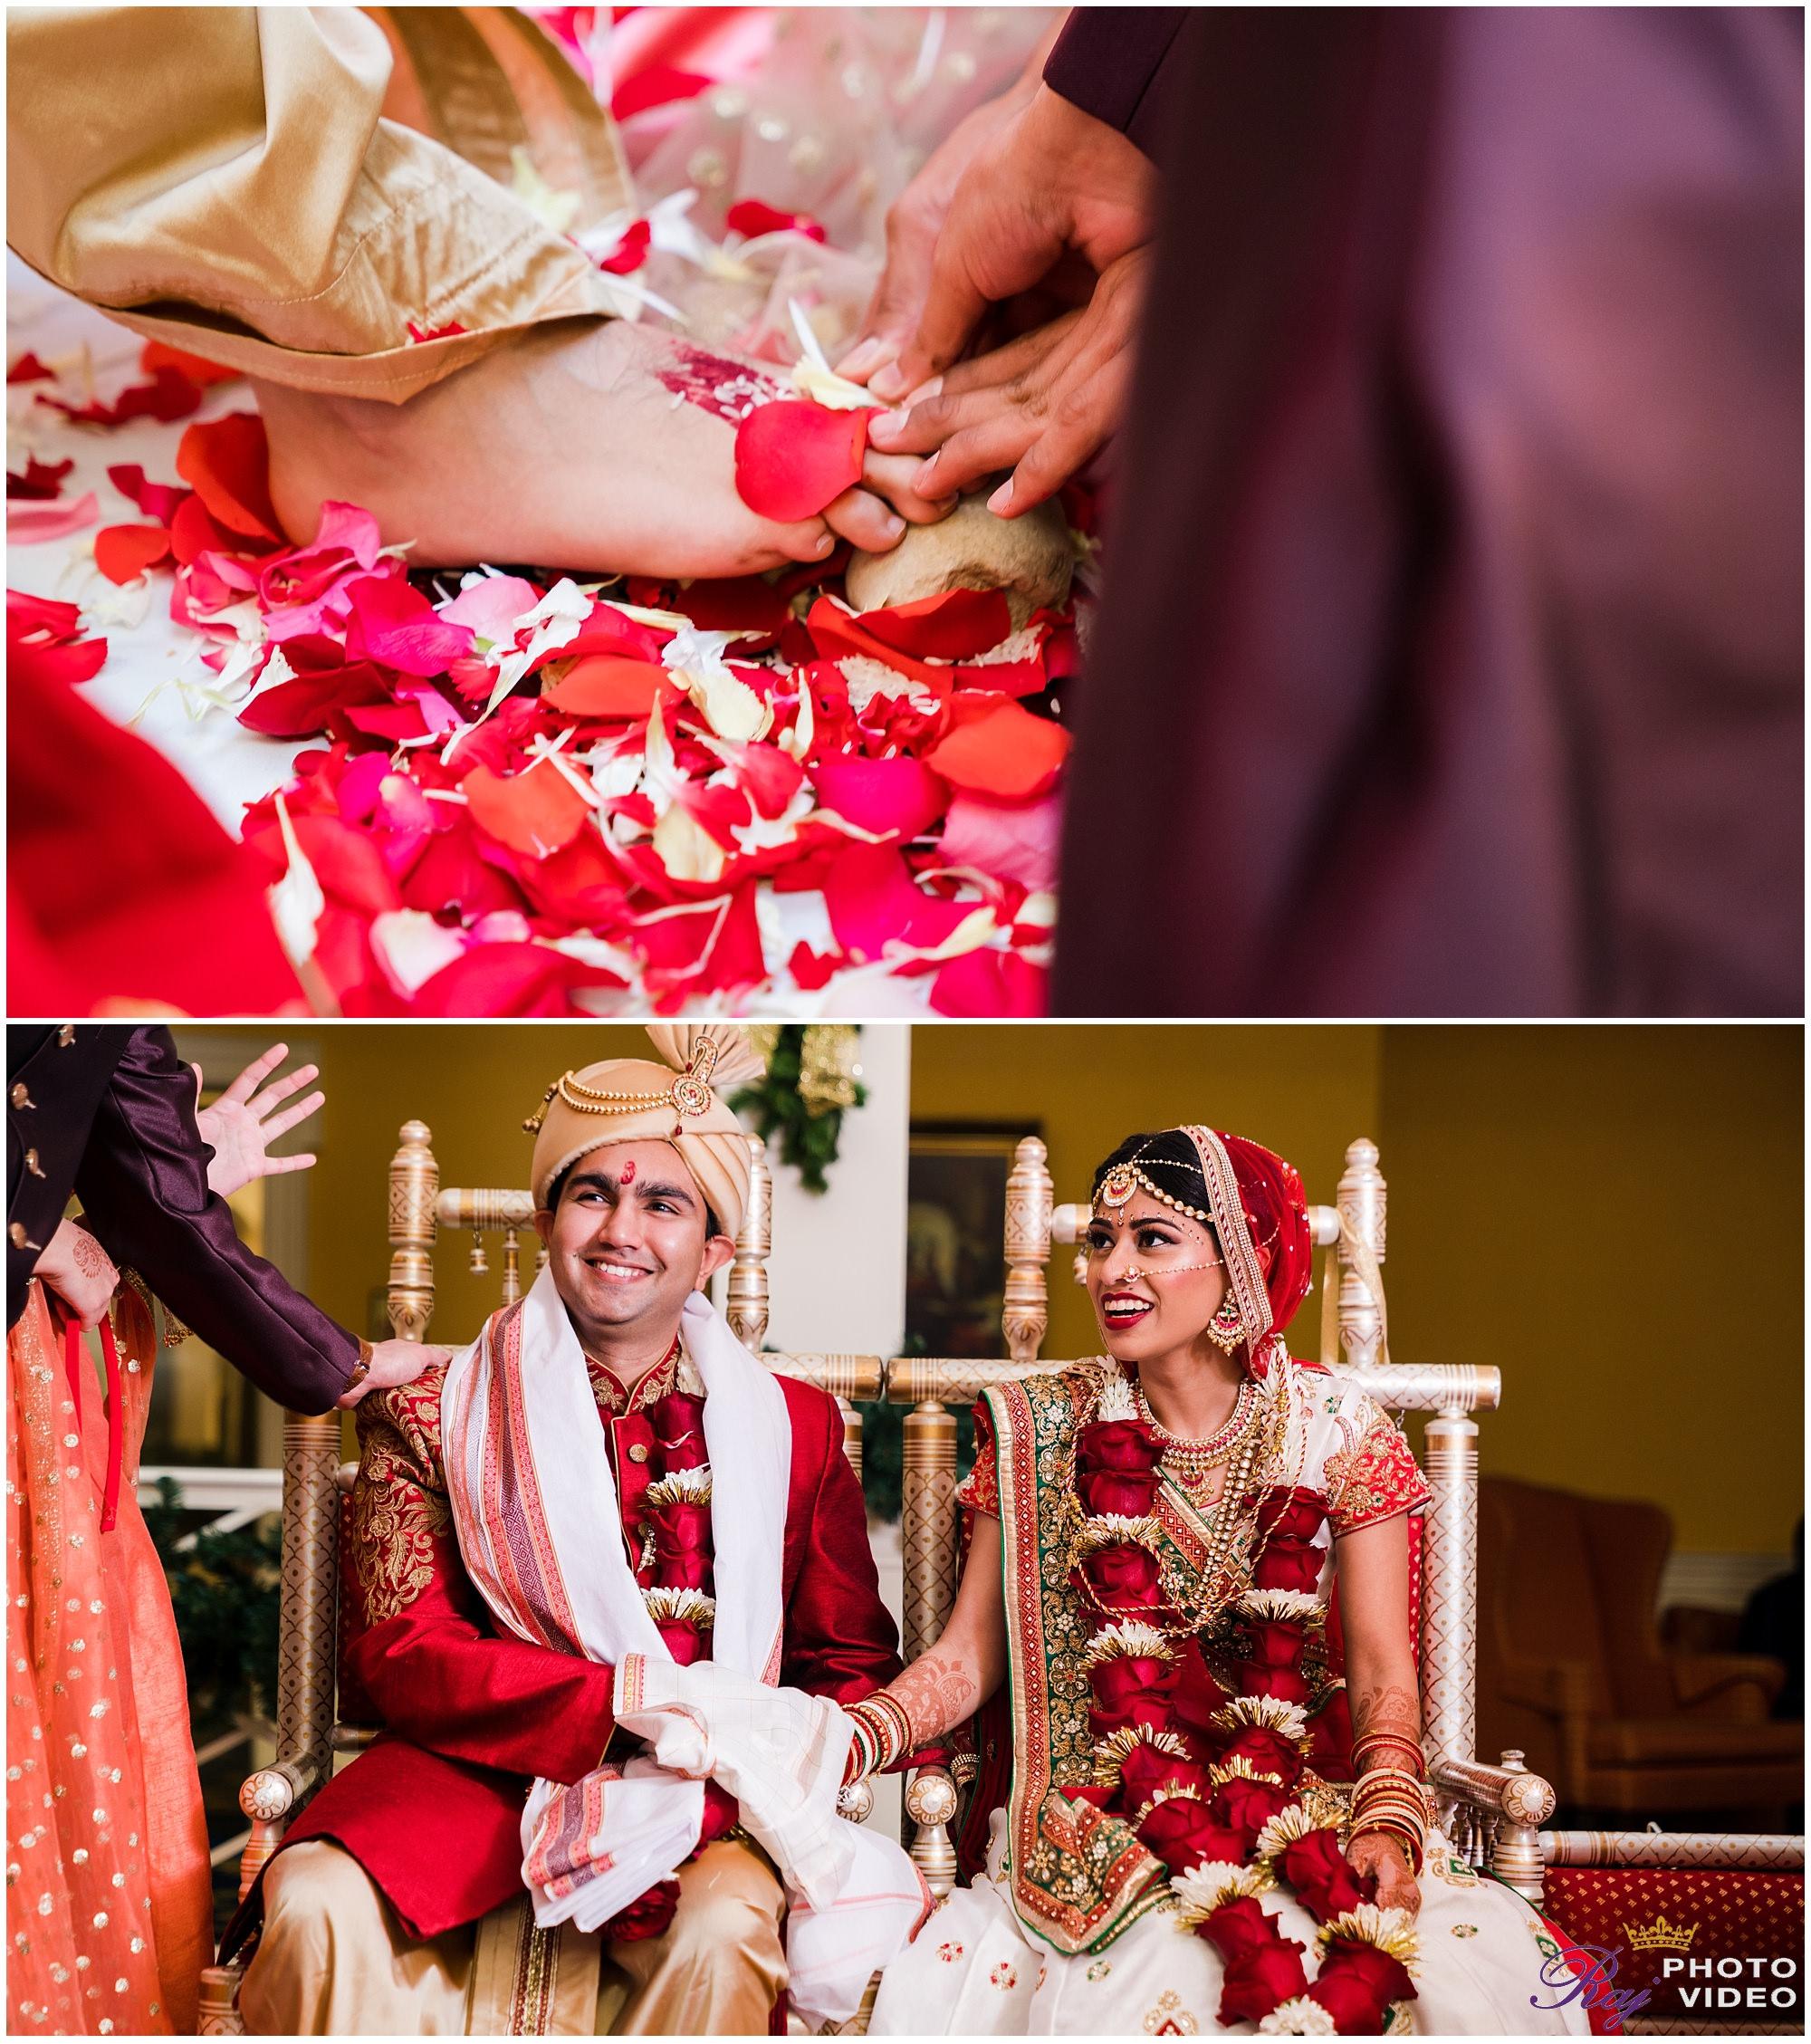 Founders-Inn-and-Spa-Virginia-Beach-VA-Indian-Wedding-Harini-Vivek-44.jpg